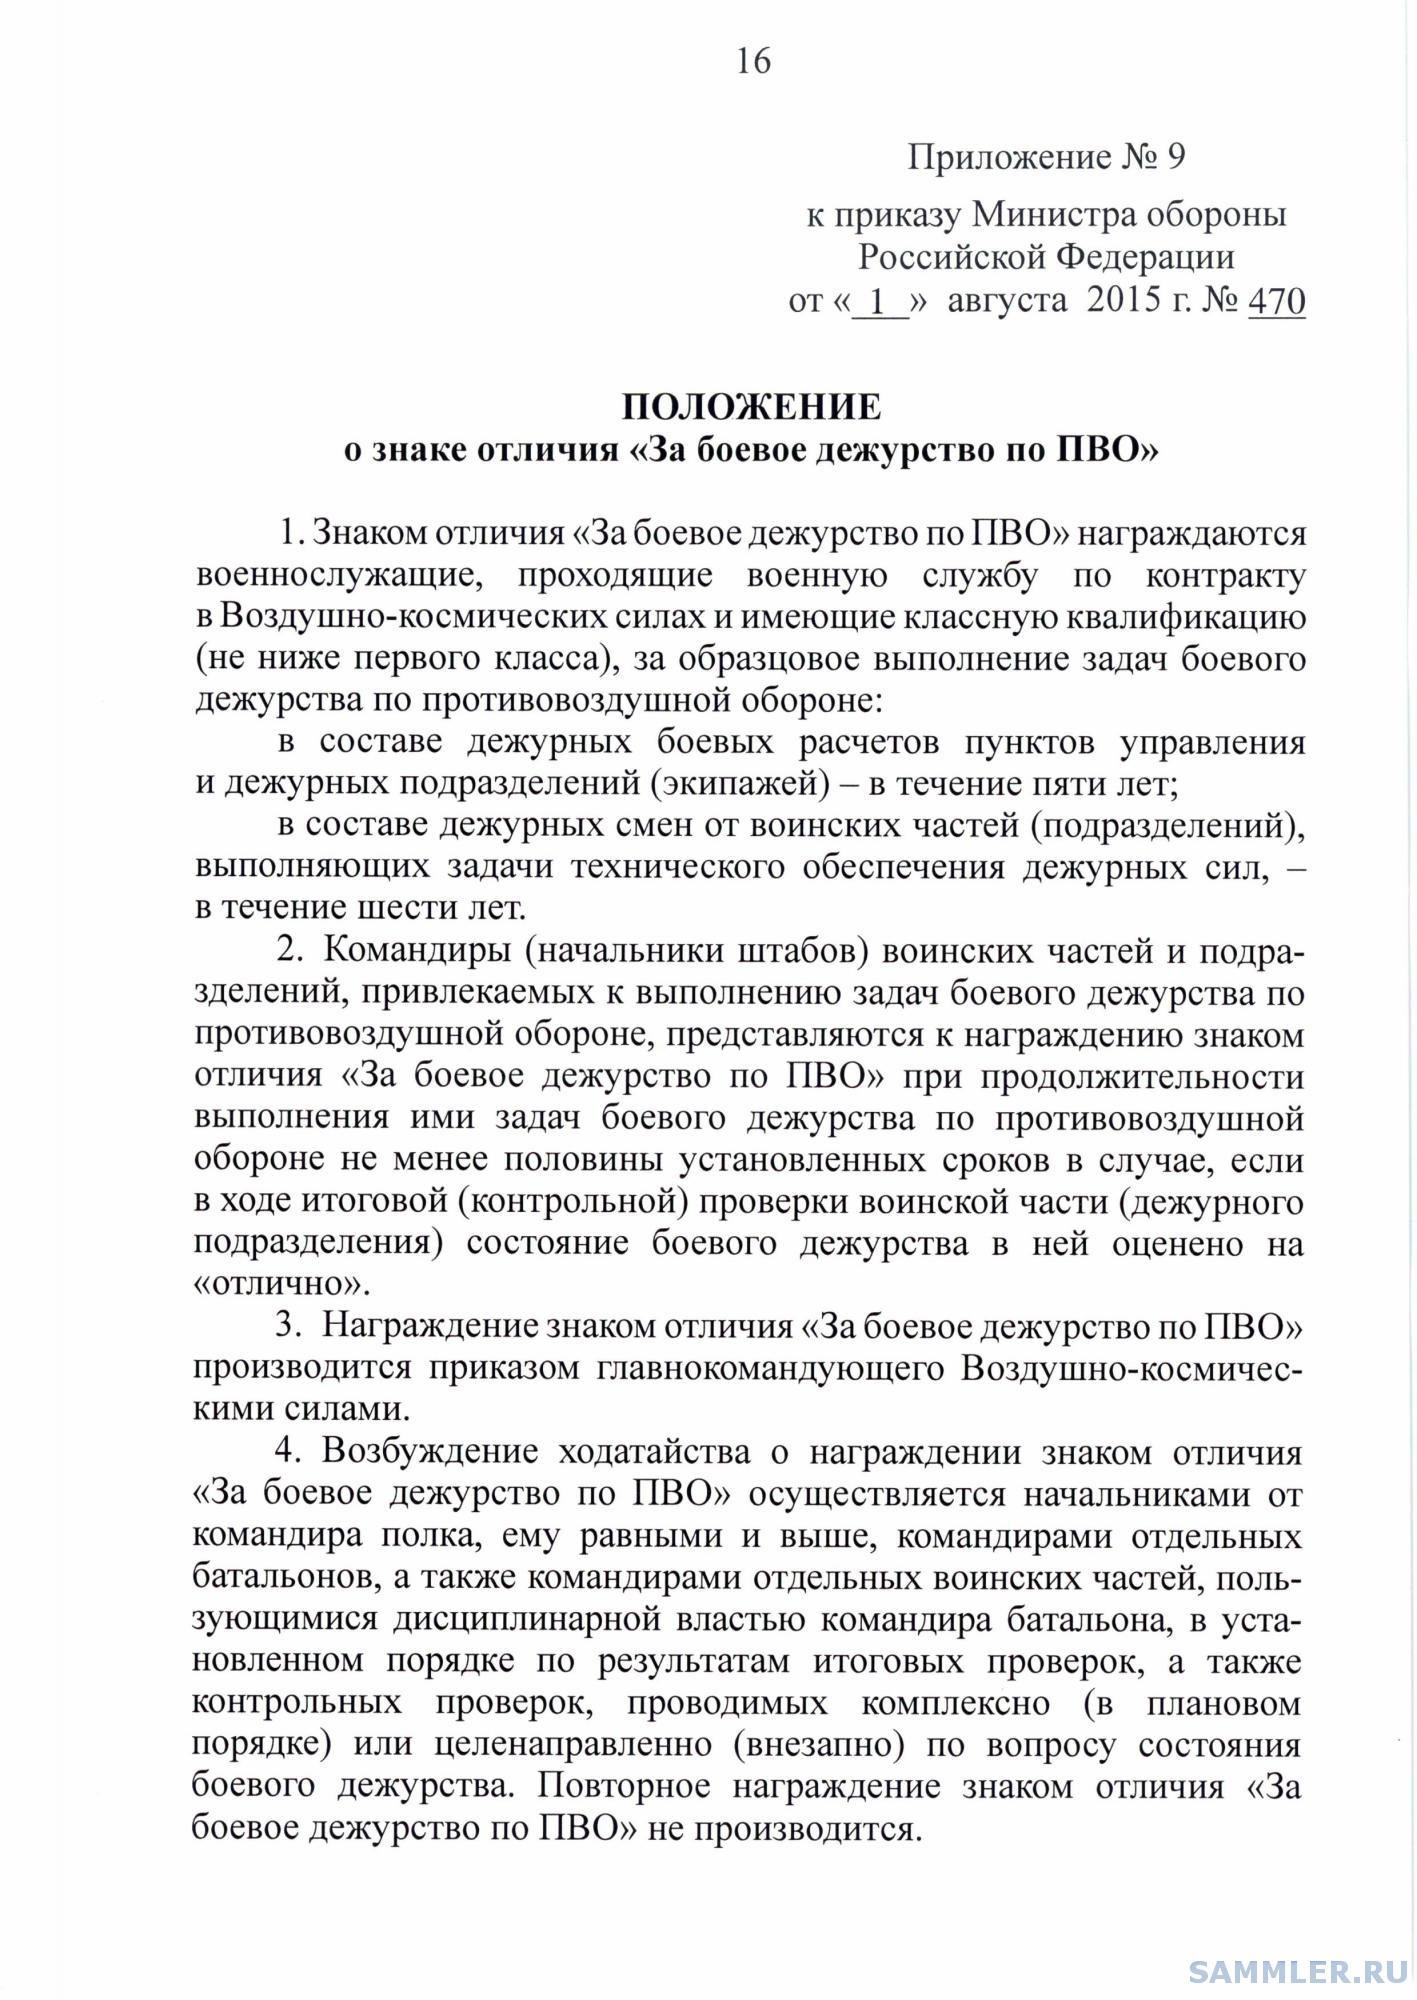 МО РФ 470(цвет)-16.jpg